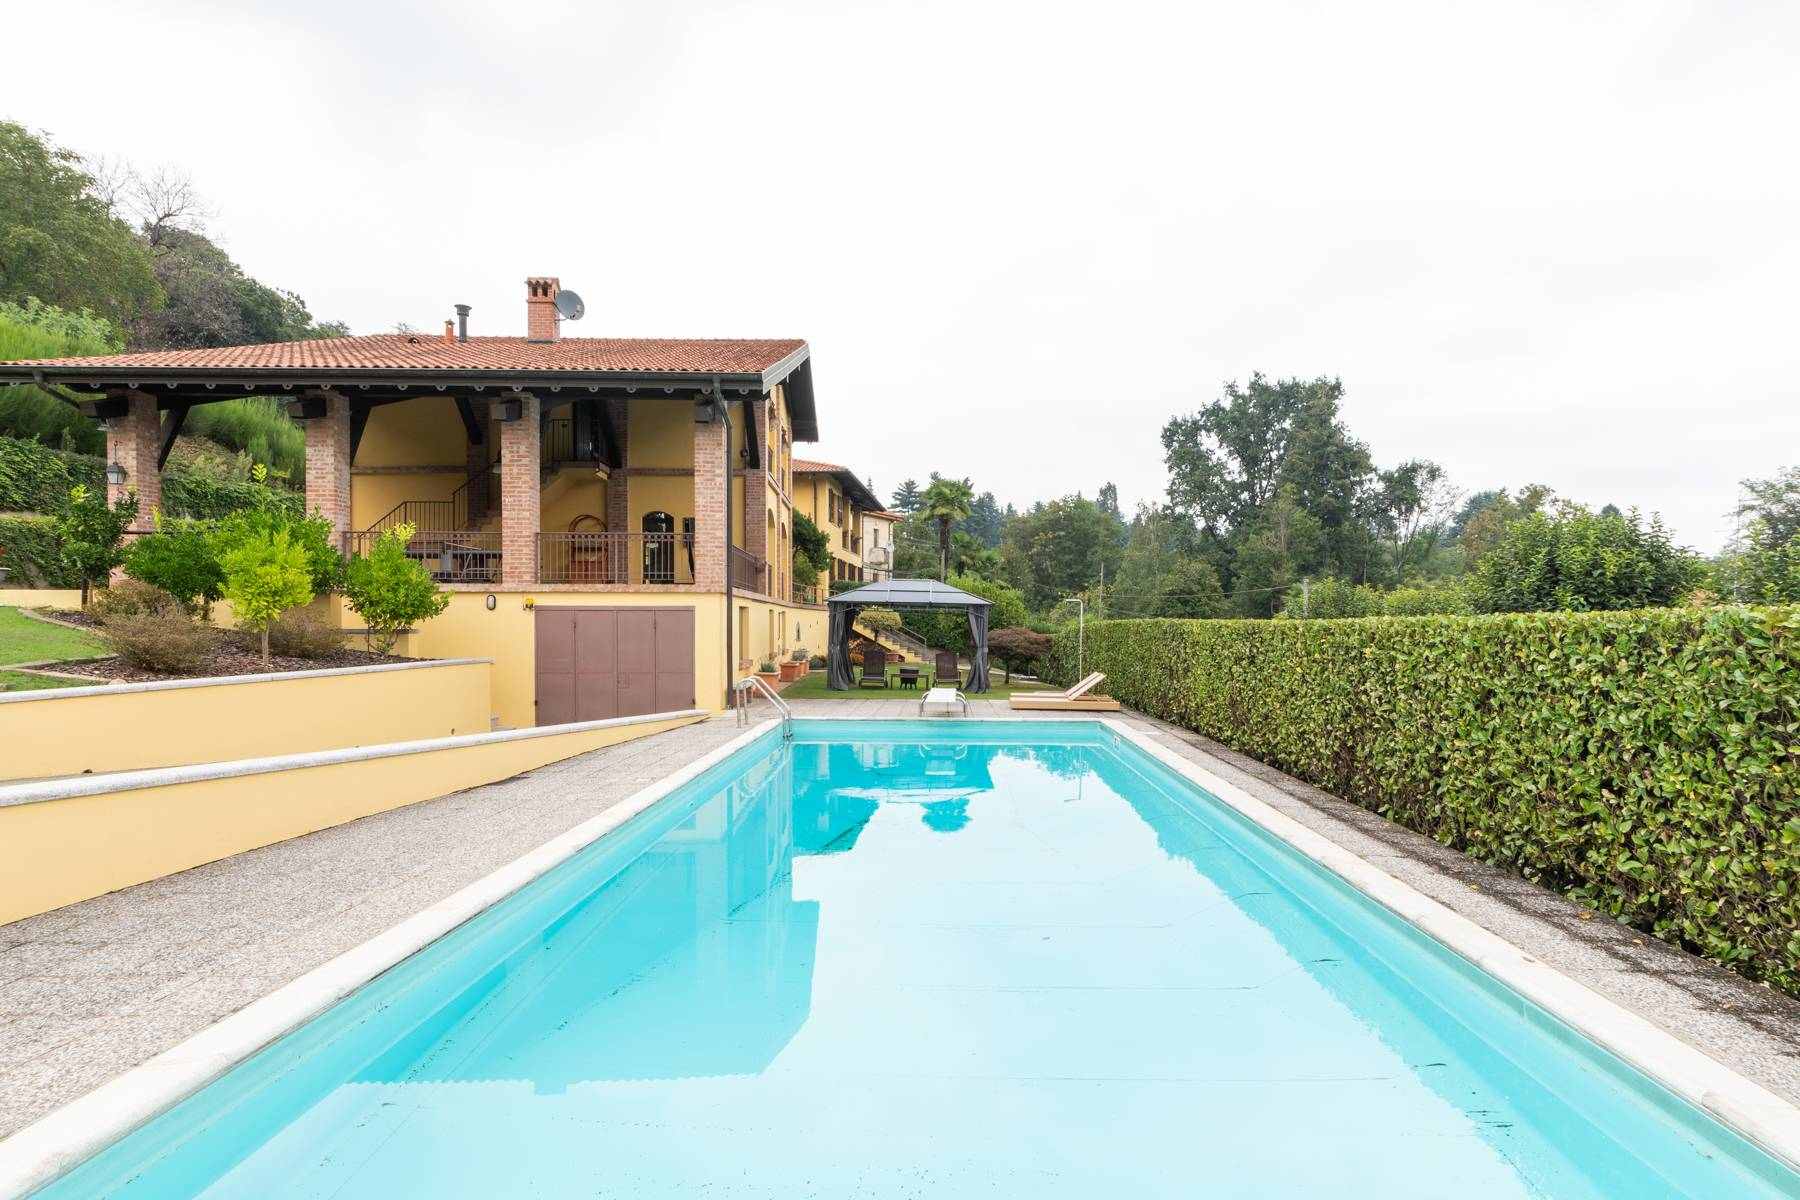 Villa in Vendita a Arona via campagna